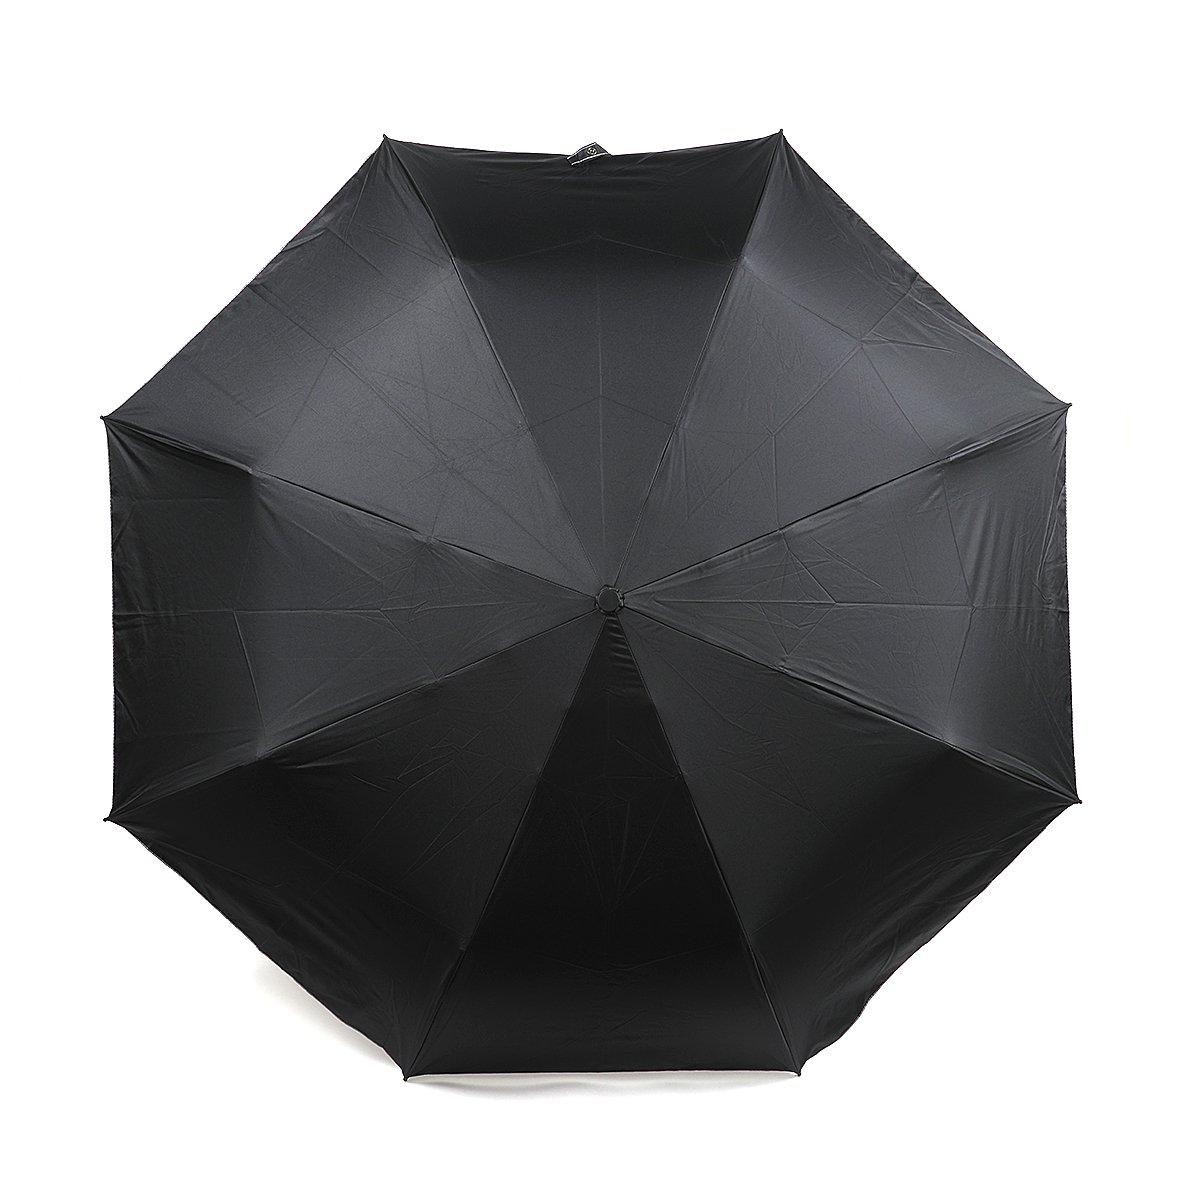 608K UV FOLDING UMBRELLA 詳細画像2